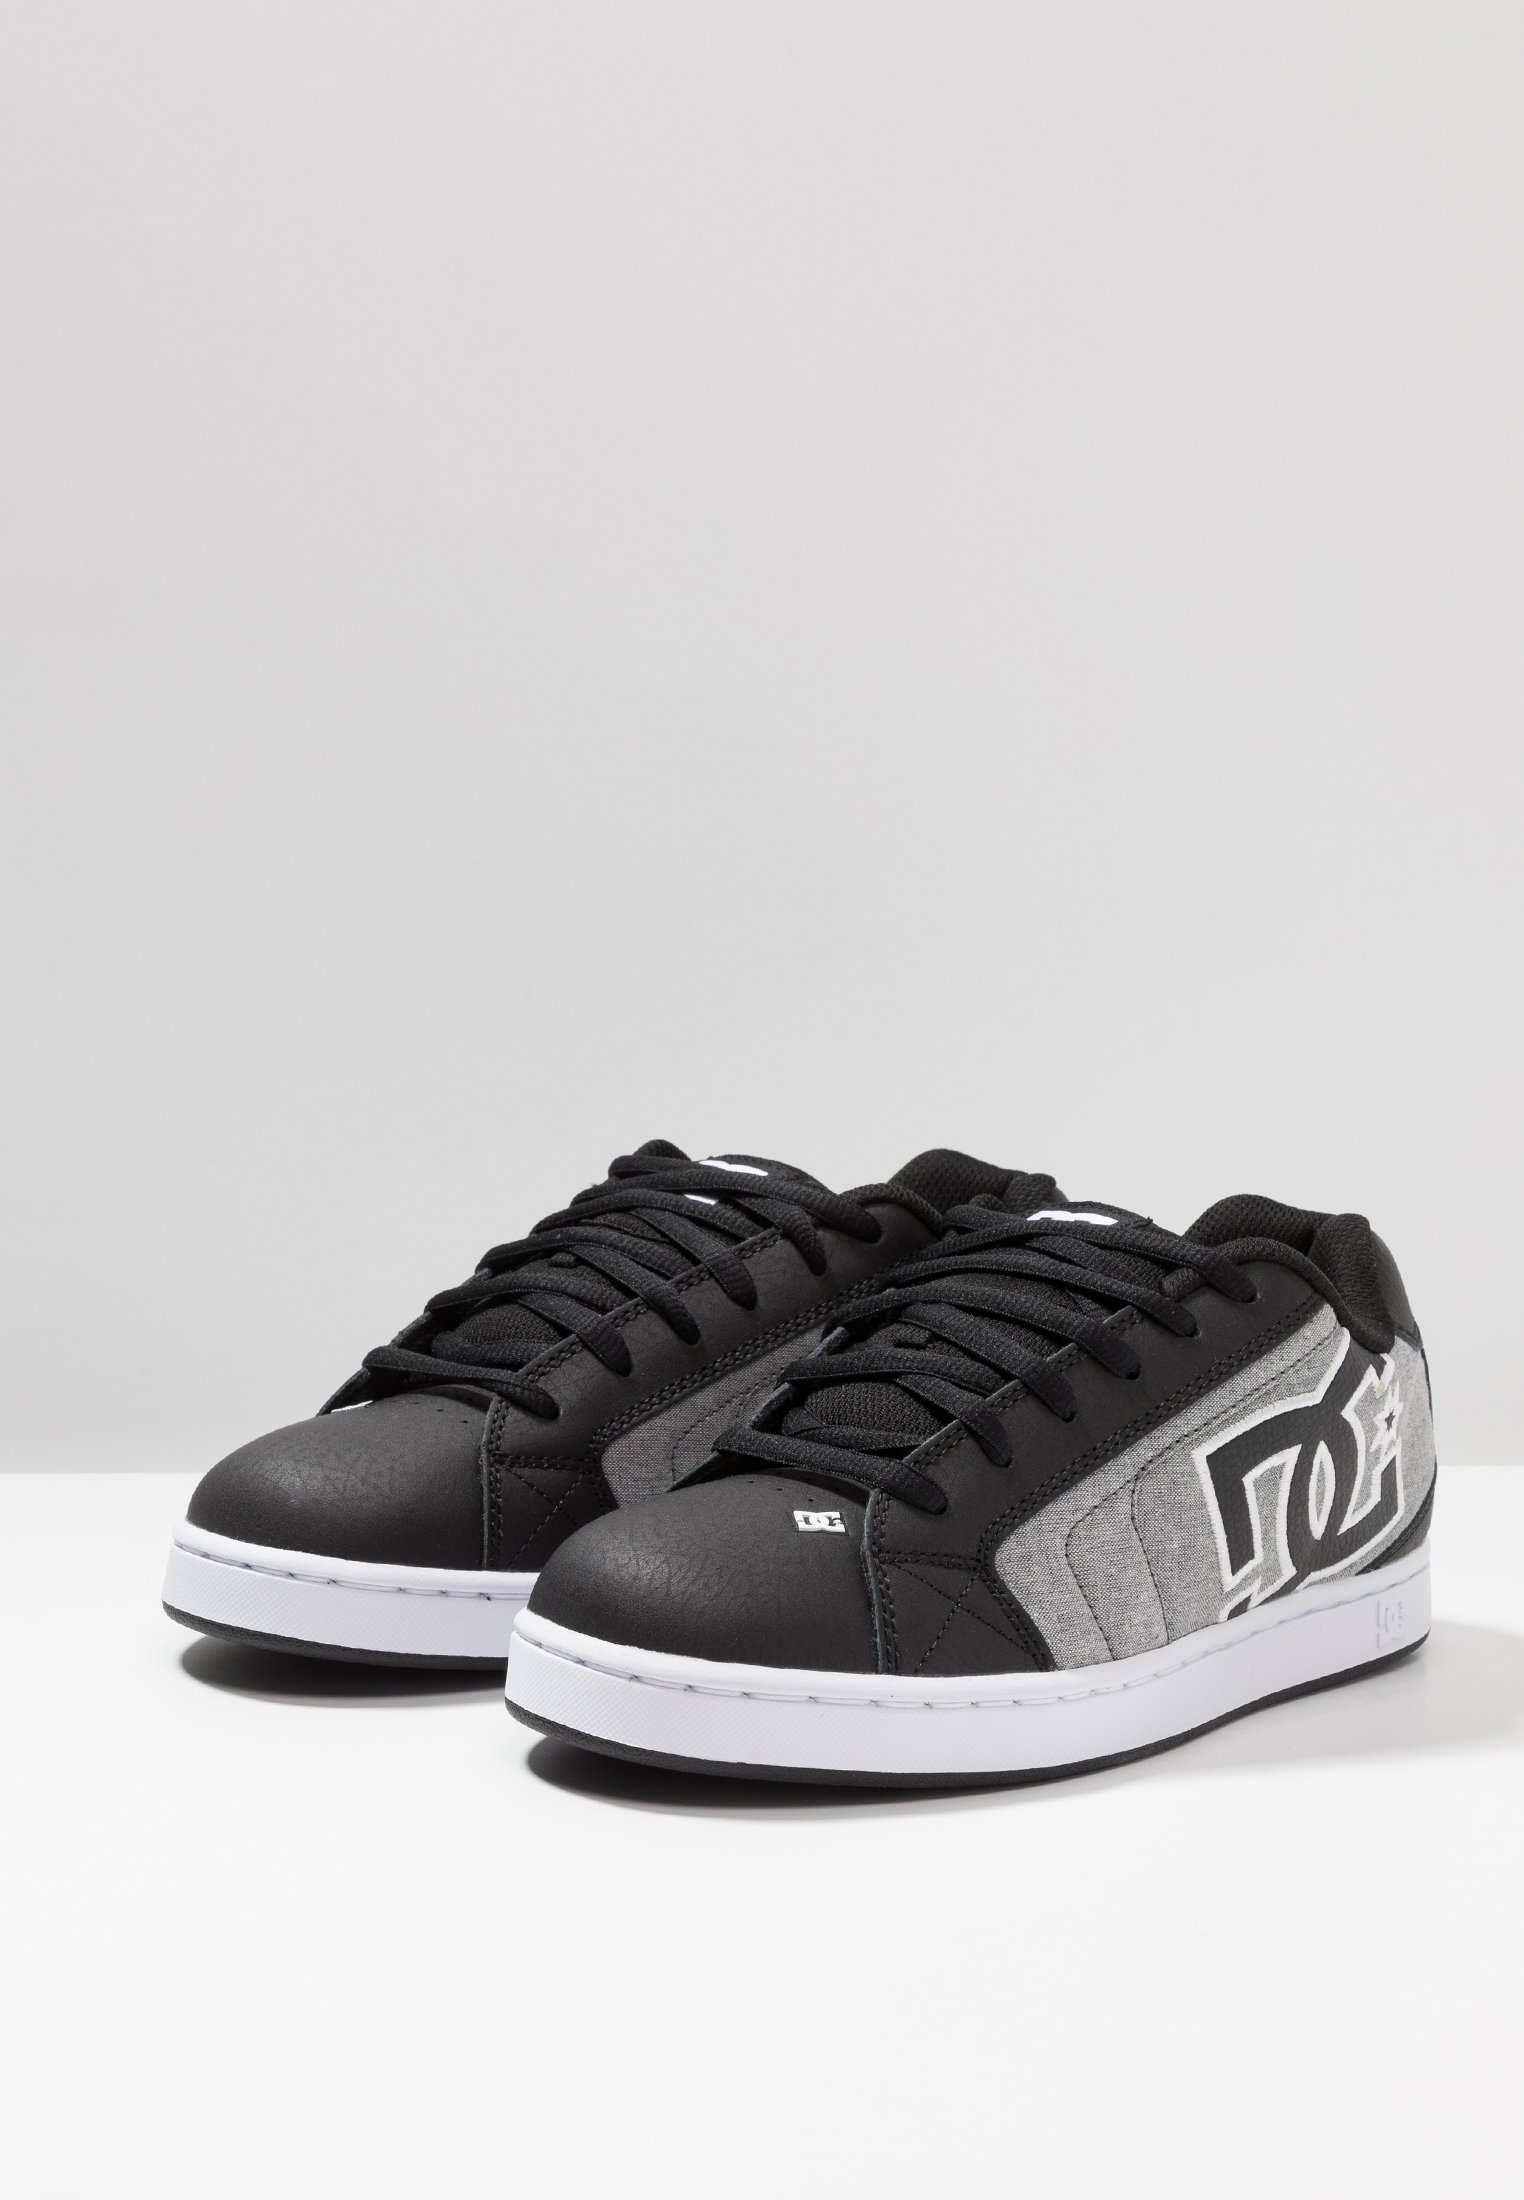 Skate Black white Dc Shoes Net SeScarpe XZukTlwPiO